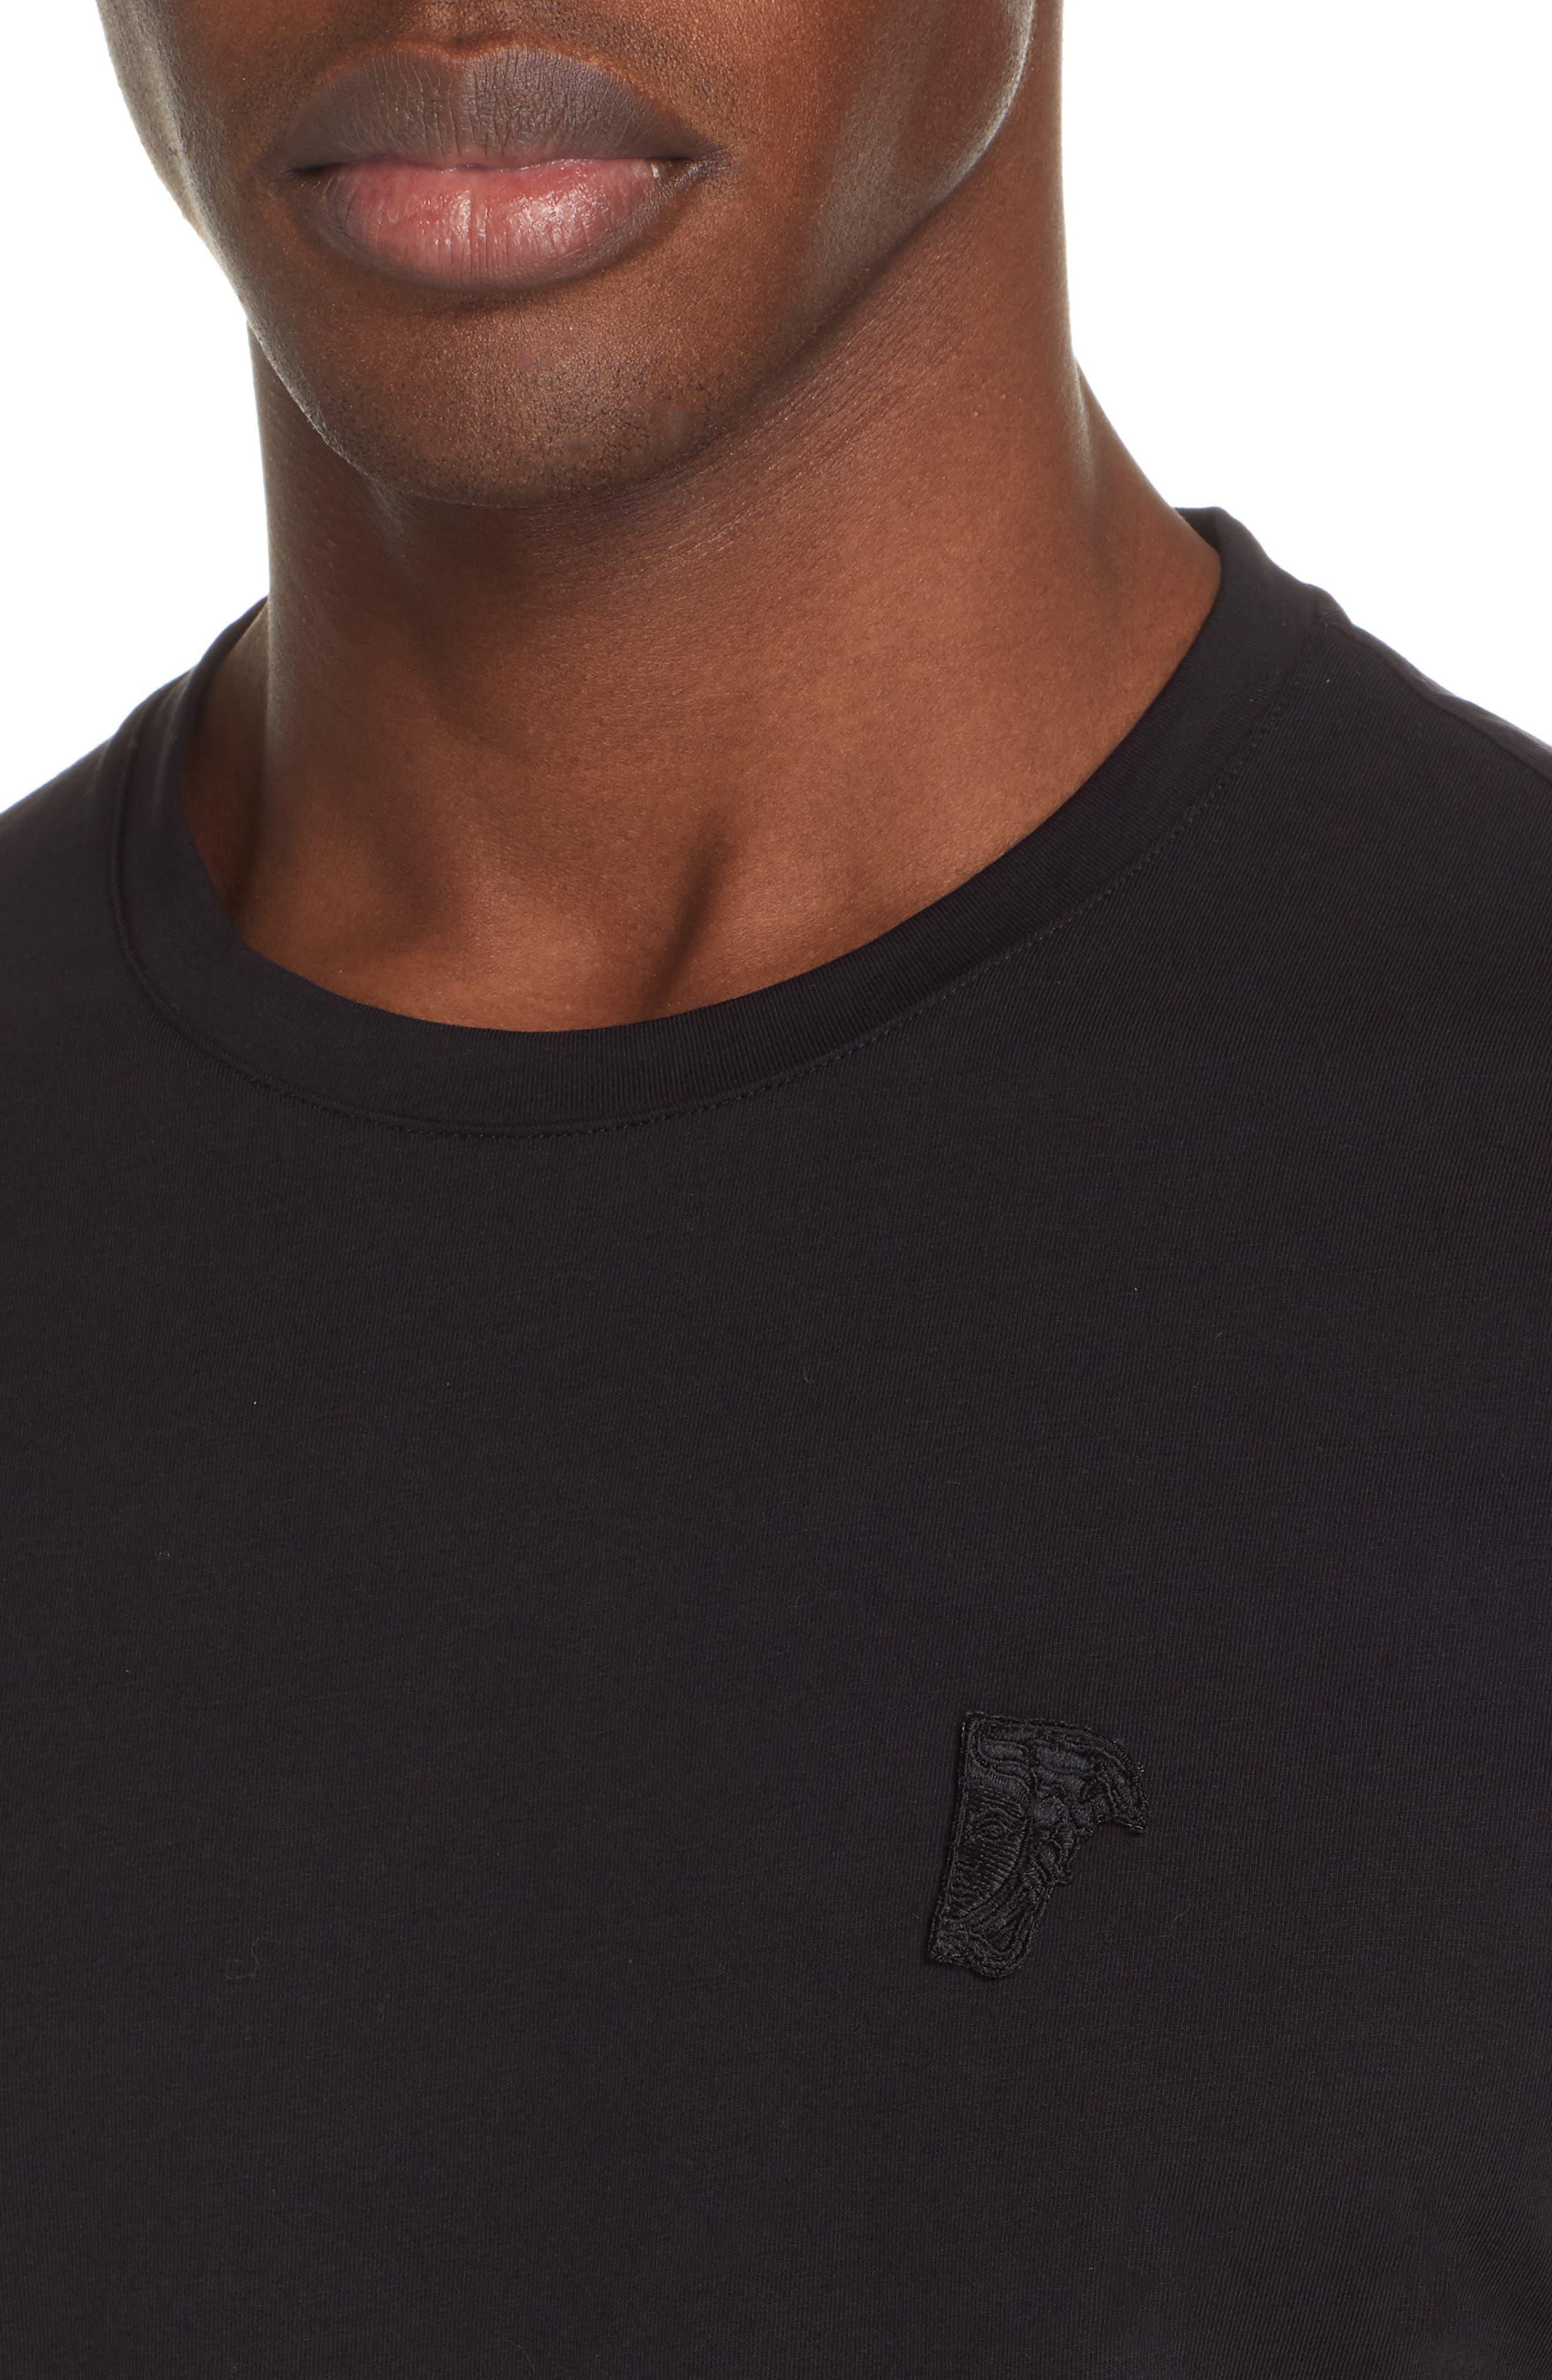 VERSACE COLLECTION,                             Half Medusa T-Shirt,                             Alternate thumbnail 4, color,                             BLACK